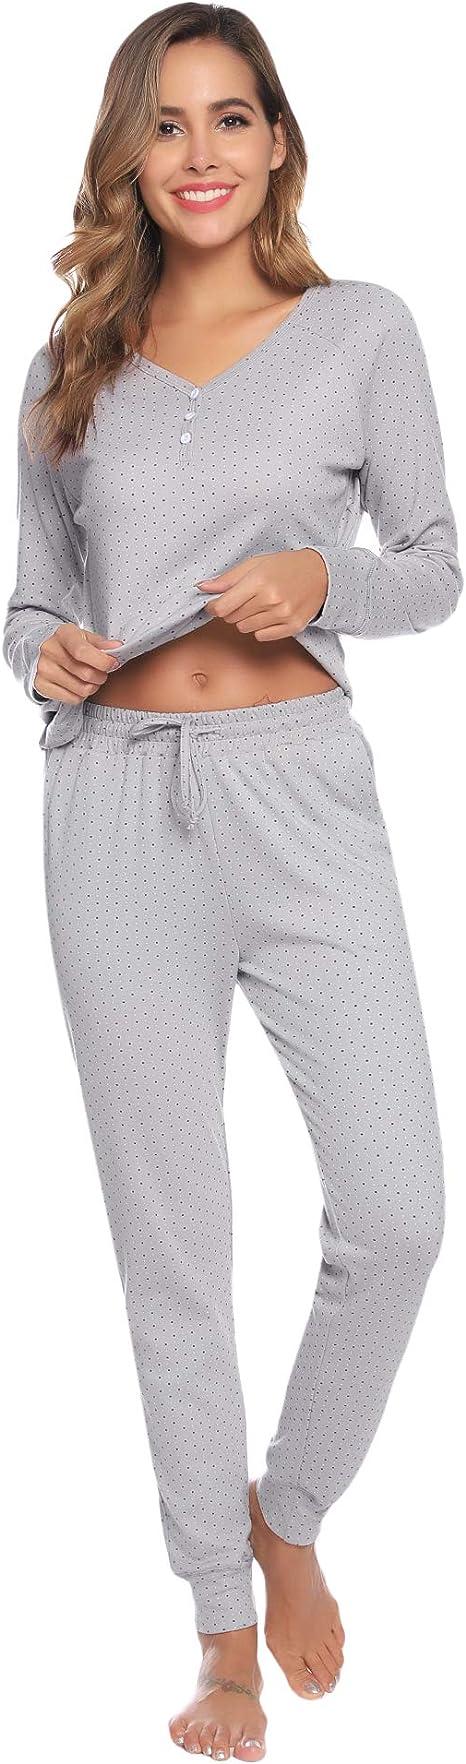 Aibrou Women Pajama Pants Cotton Striped Pajama Bottoms Sleep Pants